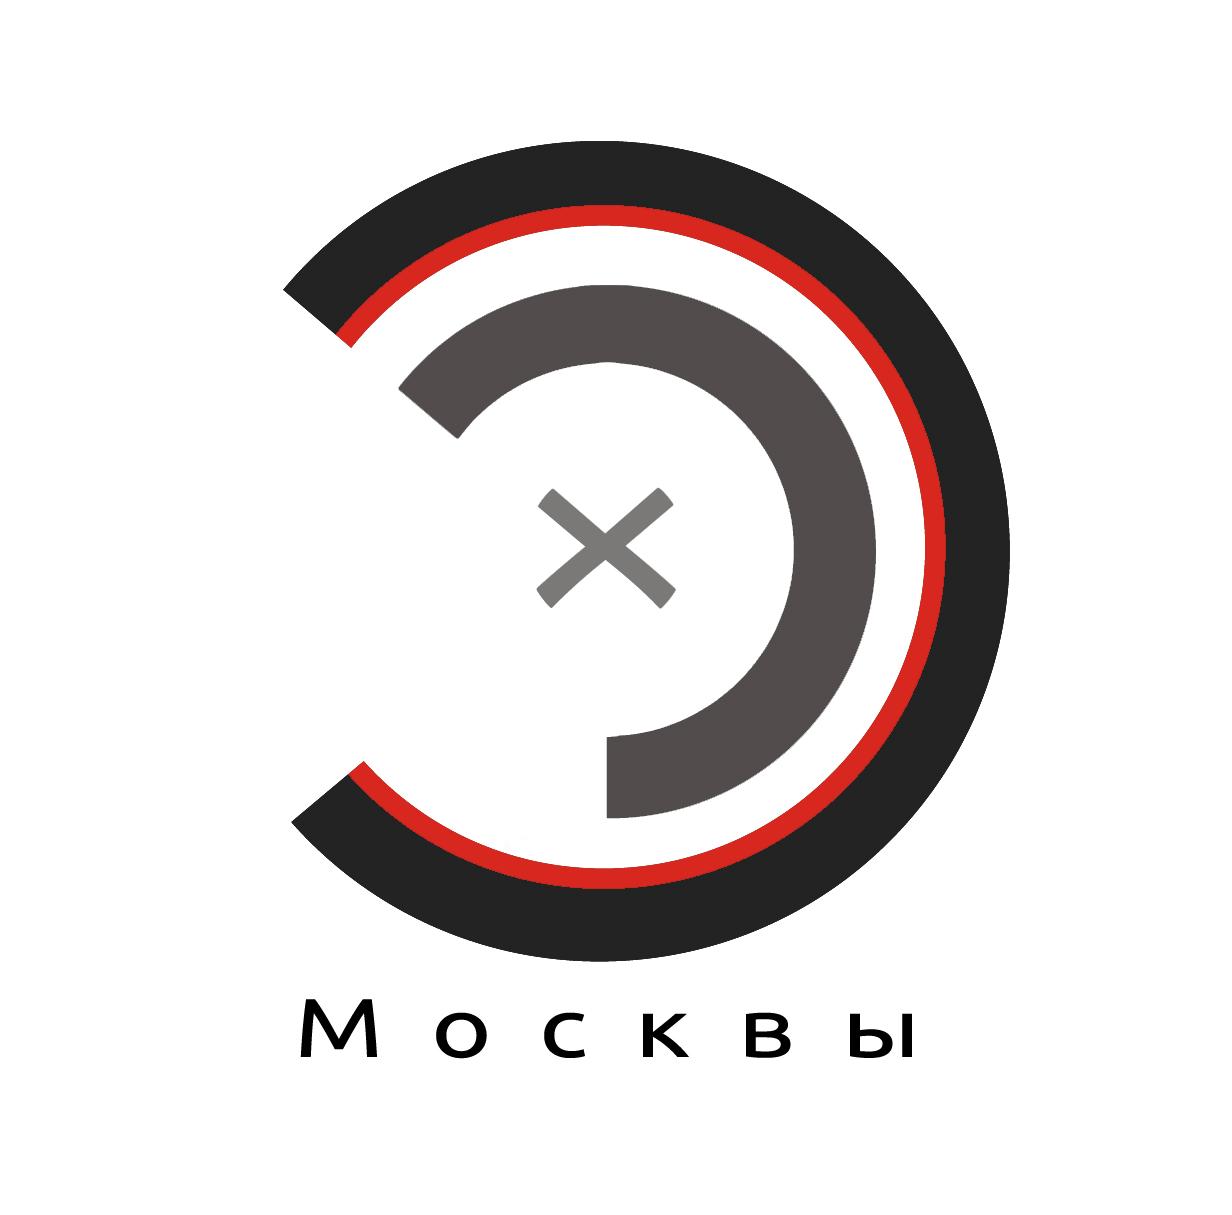 Дизайн логотипа р/с Эхо Москвы. фото f_6125622c3600759d.jpg